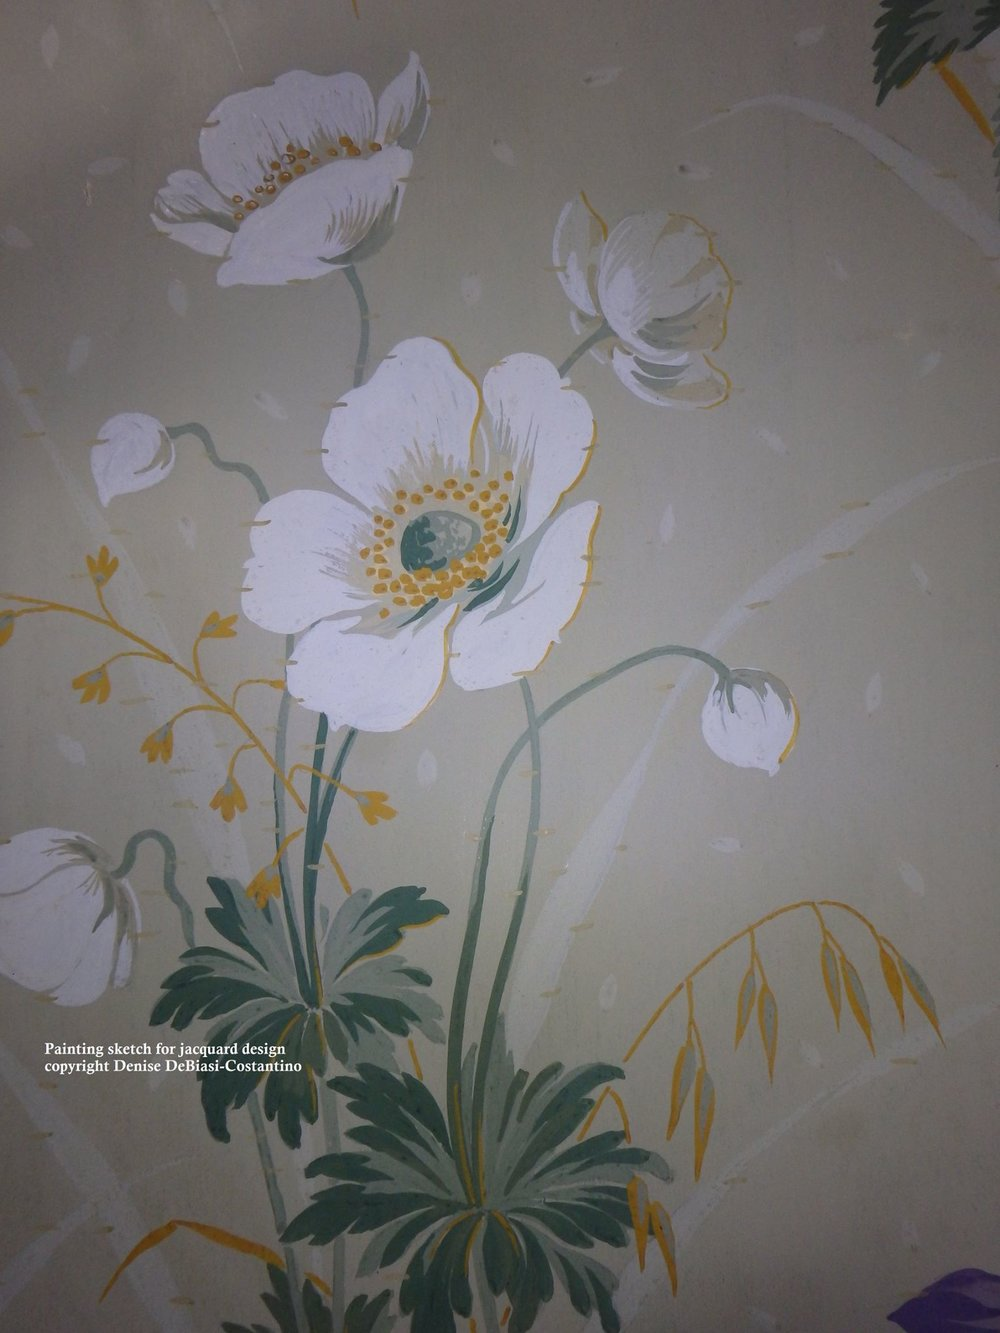 floral designs jacquard and prints surface designs